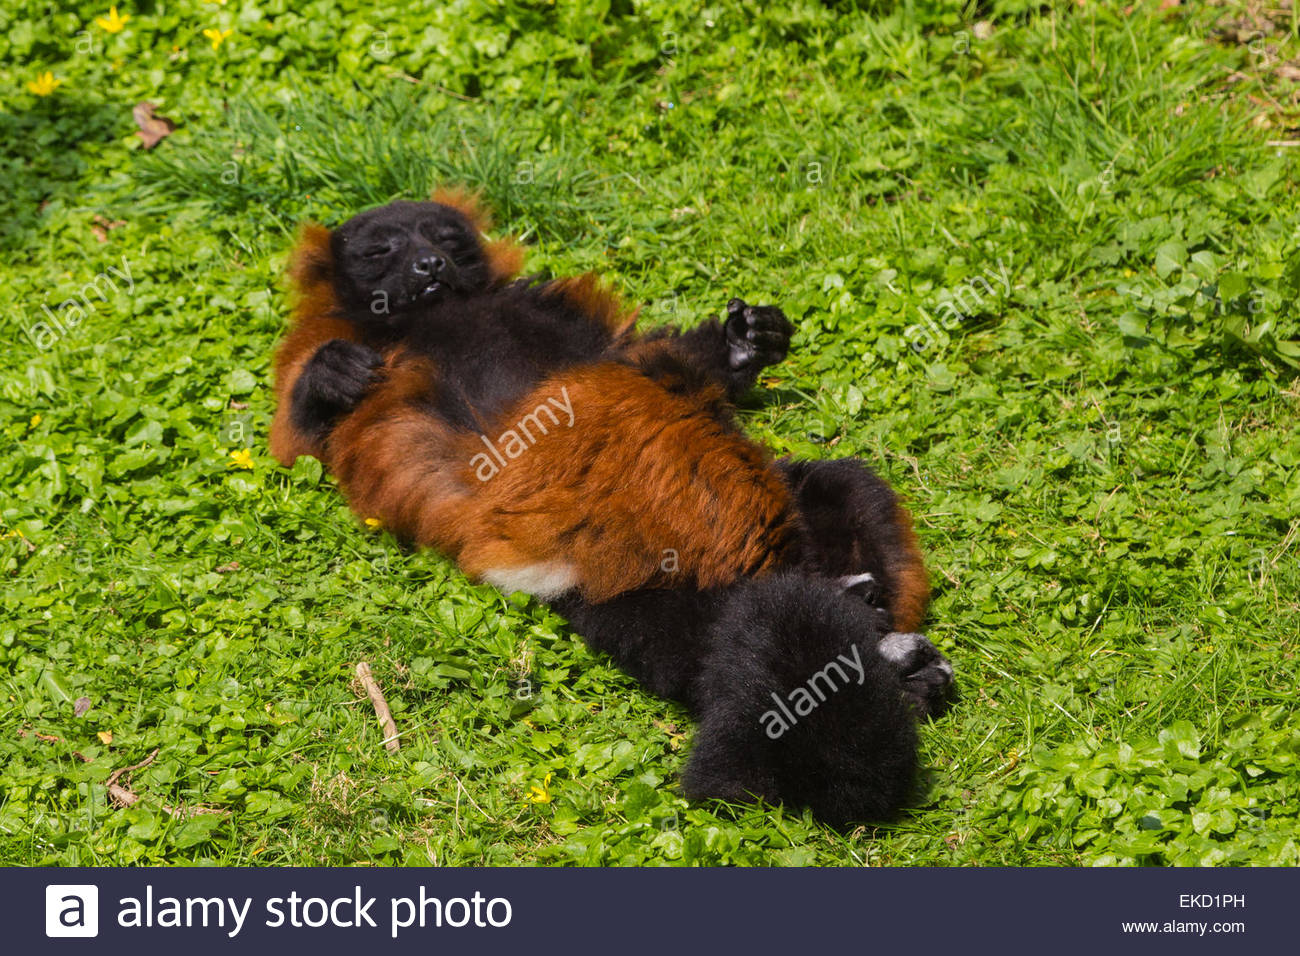 A Red-Ruffed Lemur posed like a sunbather lying on its back enjoying bright sunshine with closed eyes. - Stock Image